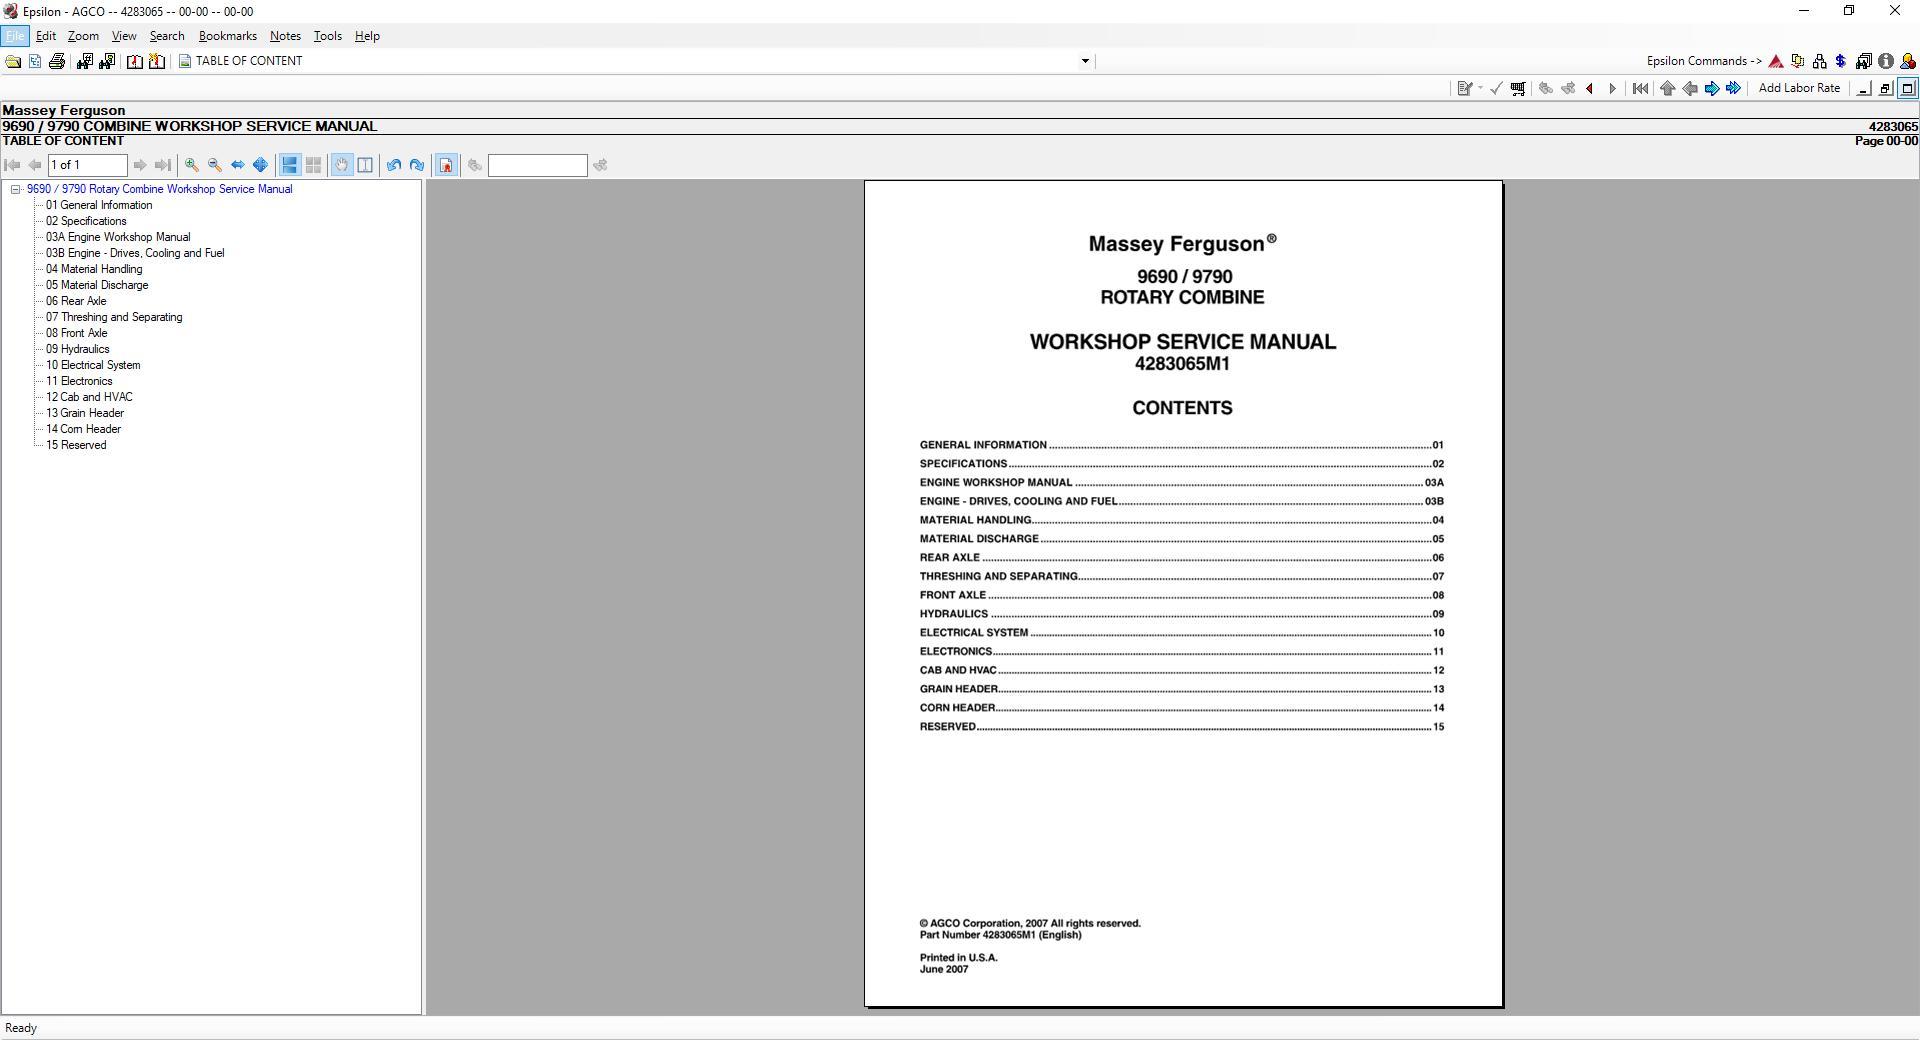 Massey_Ferguson_NA_AG_North_America_052019_Part_Book_Workshop_Service_Manuals5